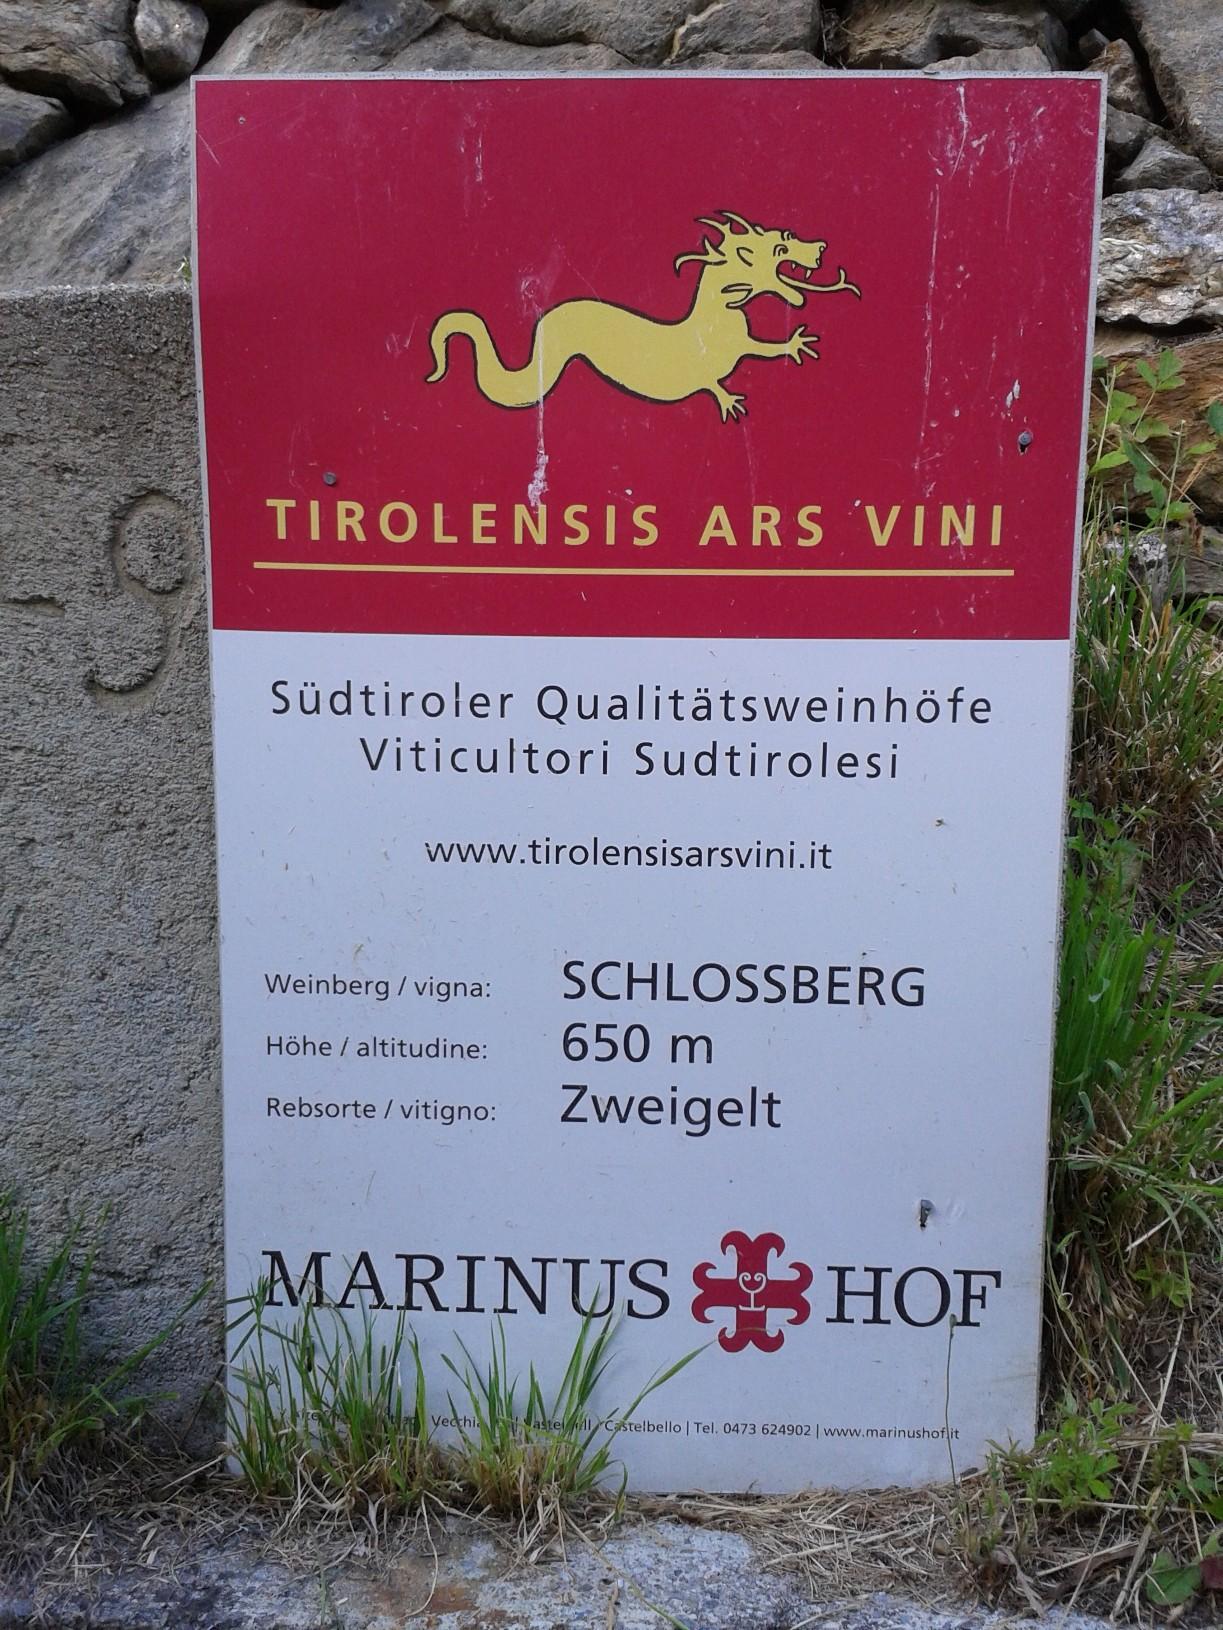 2013-08-26  Tirolensis Ars Vini